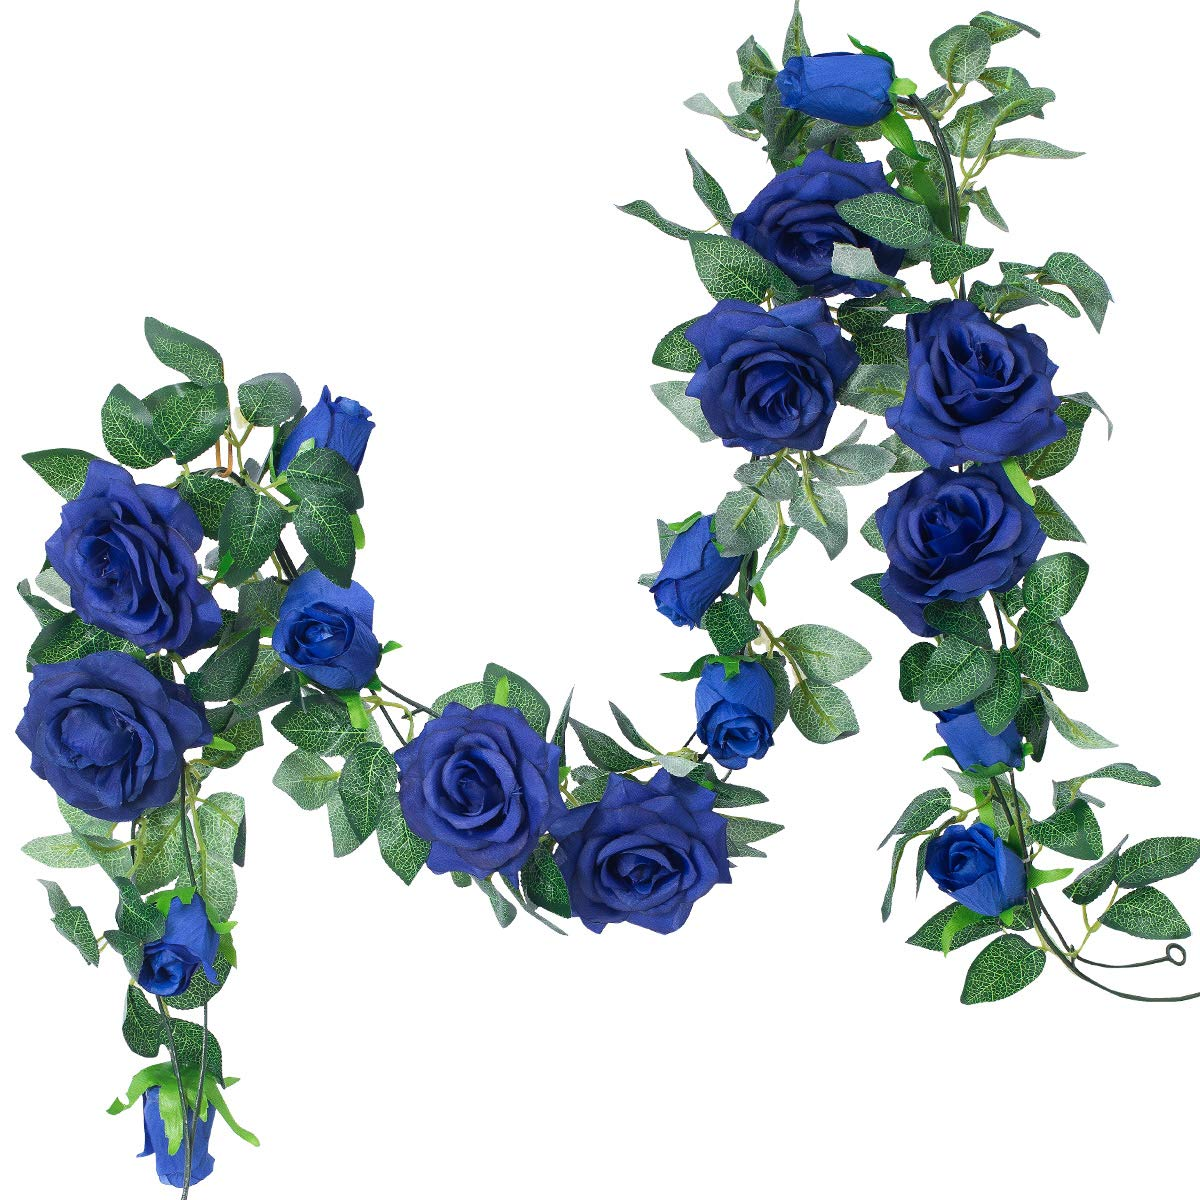 PARTY JOY 6.5Ft Artificial Rose Vine Silk Flower Garland Hanging Baskets Plants Home Outdoor Wedding Arch Garden Wall Decor,2PCS (Royal Blue)